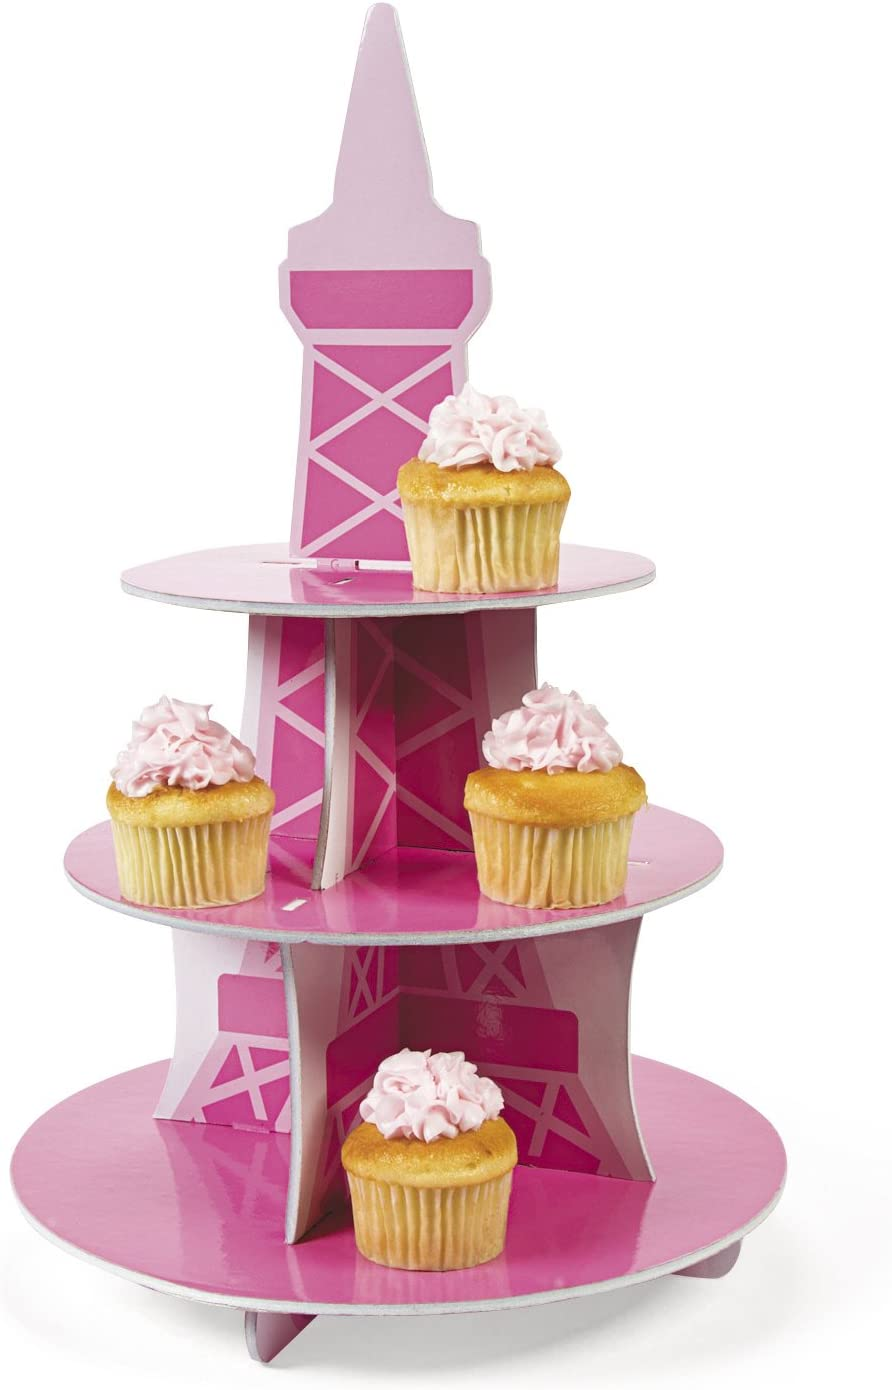 Perfectly Paris Cupcake Holder Foam COMINHKPR95322 19 X 12